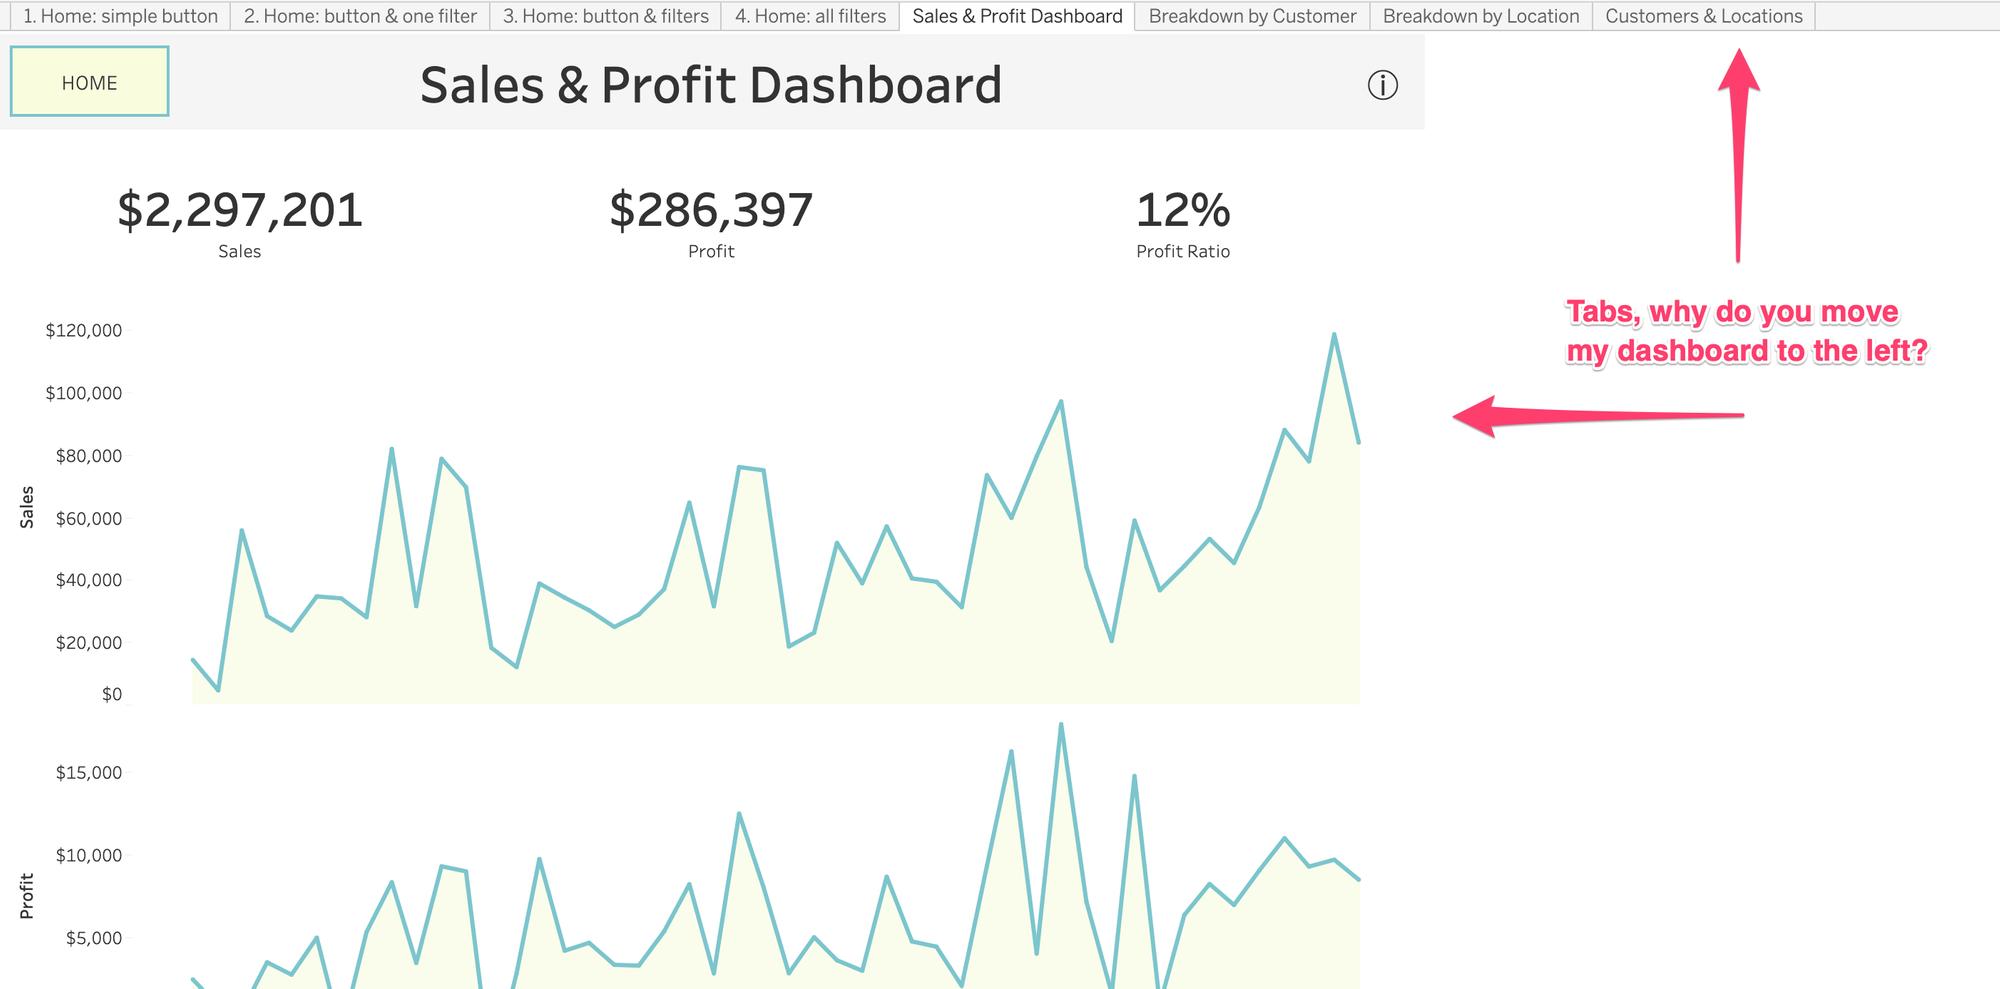 sales & profit dashboard